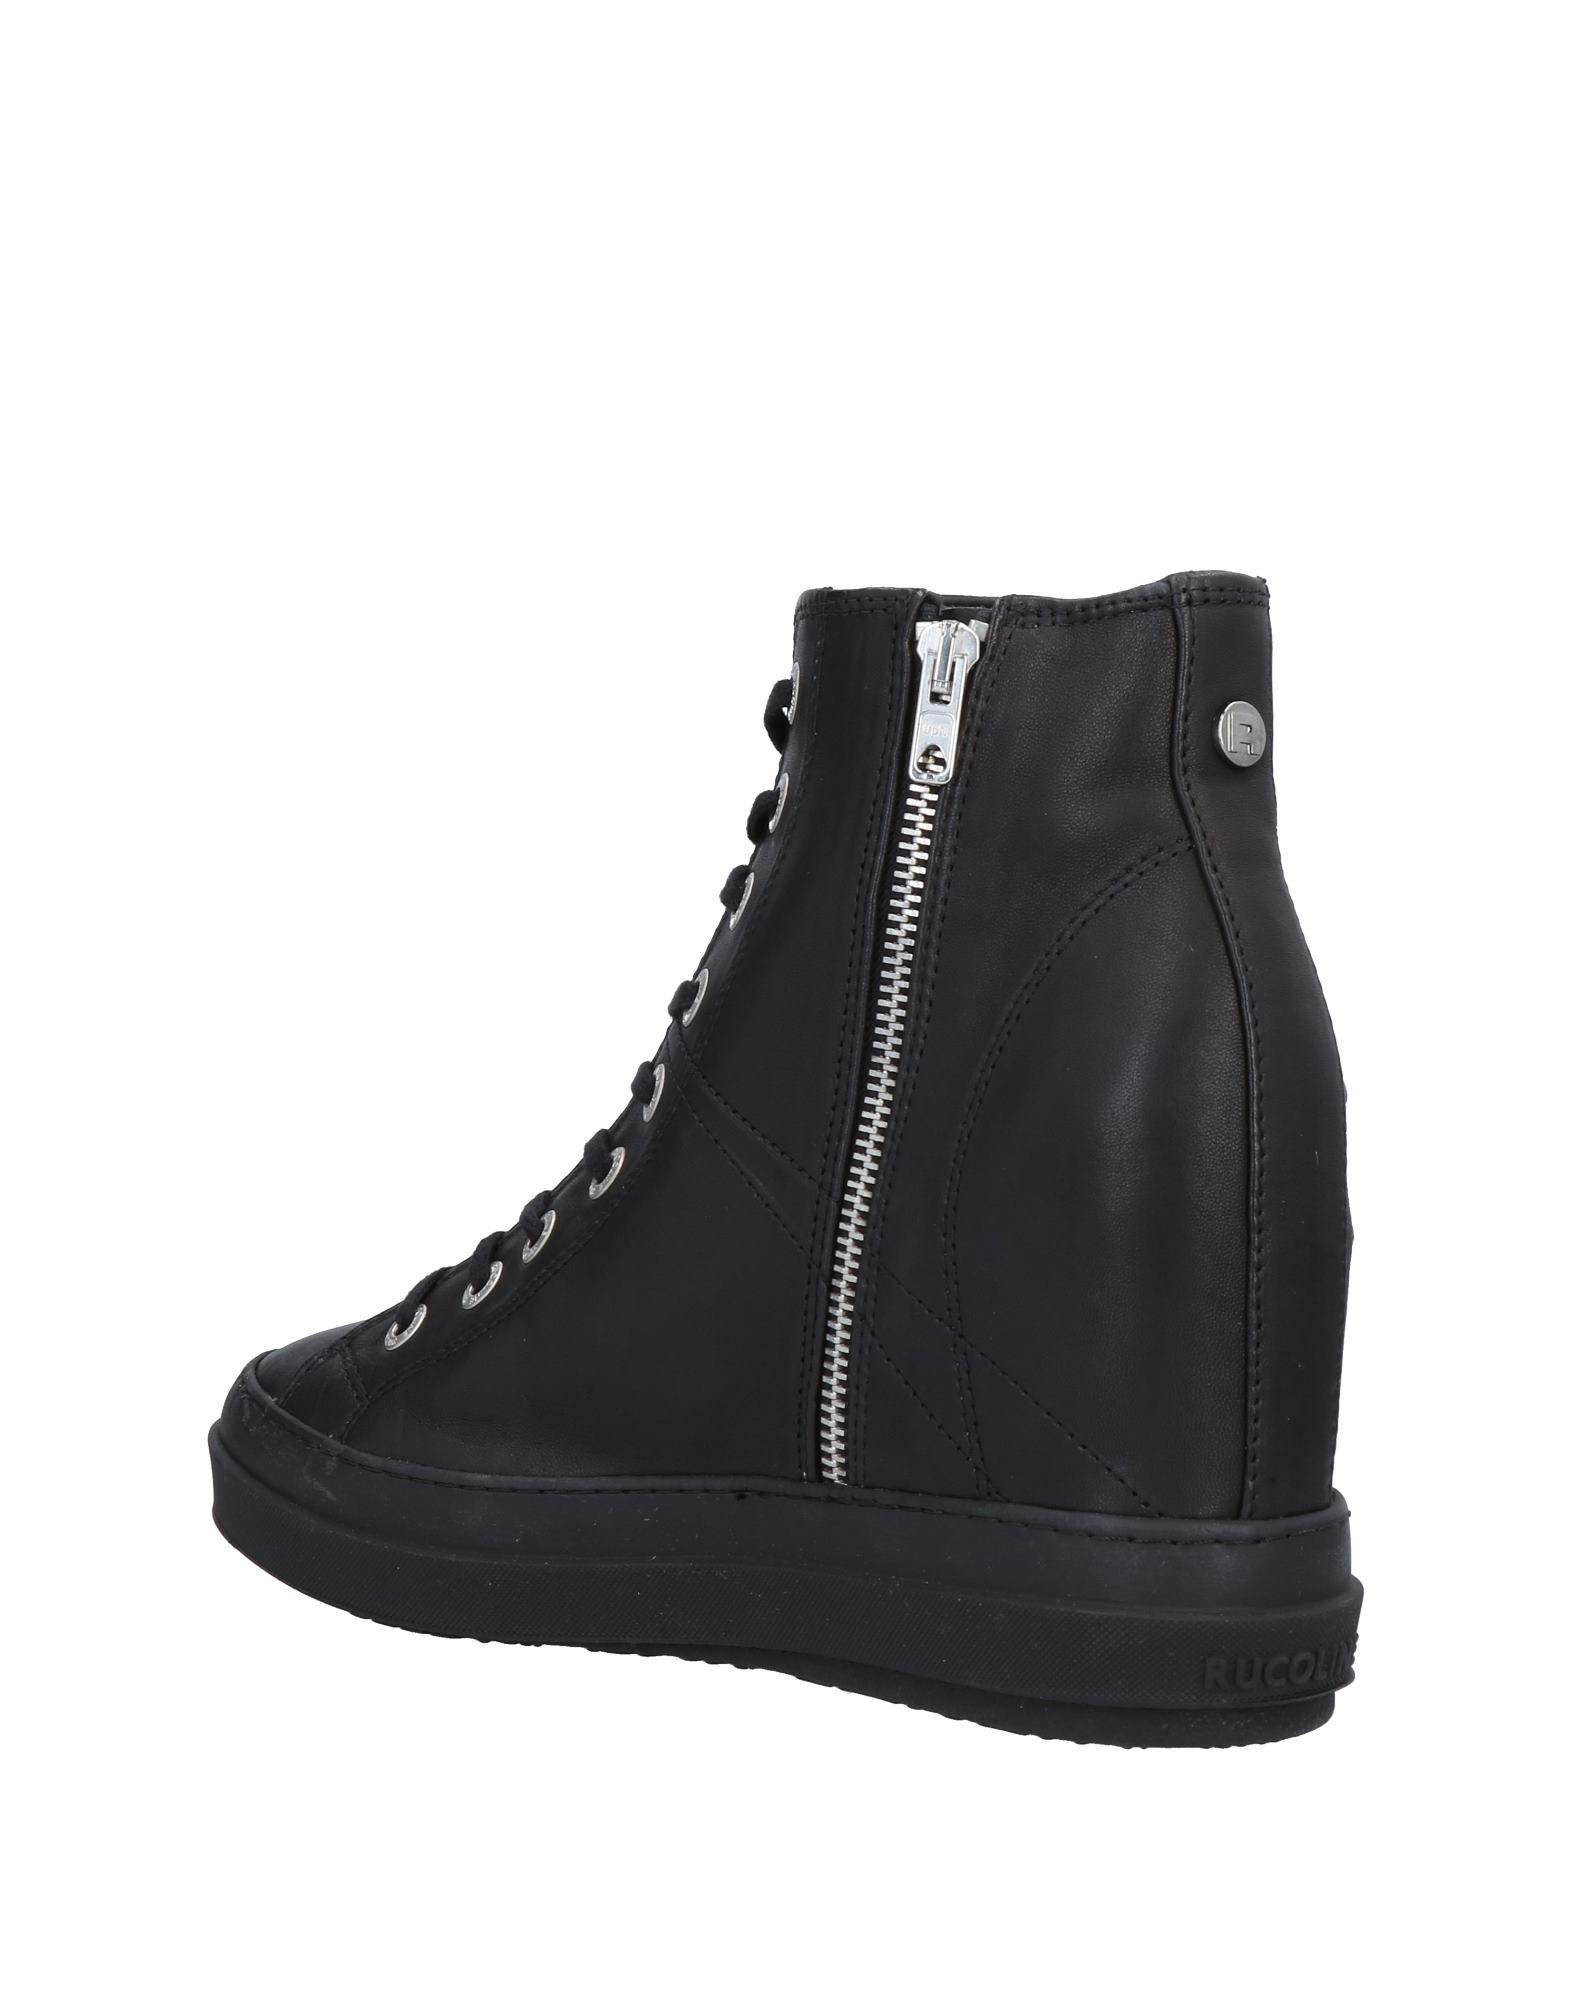 Stilvolle billige Damen Schuhe Ruco Line Sneakers Damen billige  11223154TK 2639a6